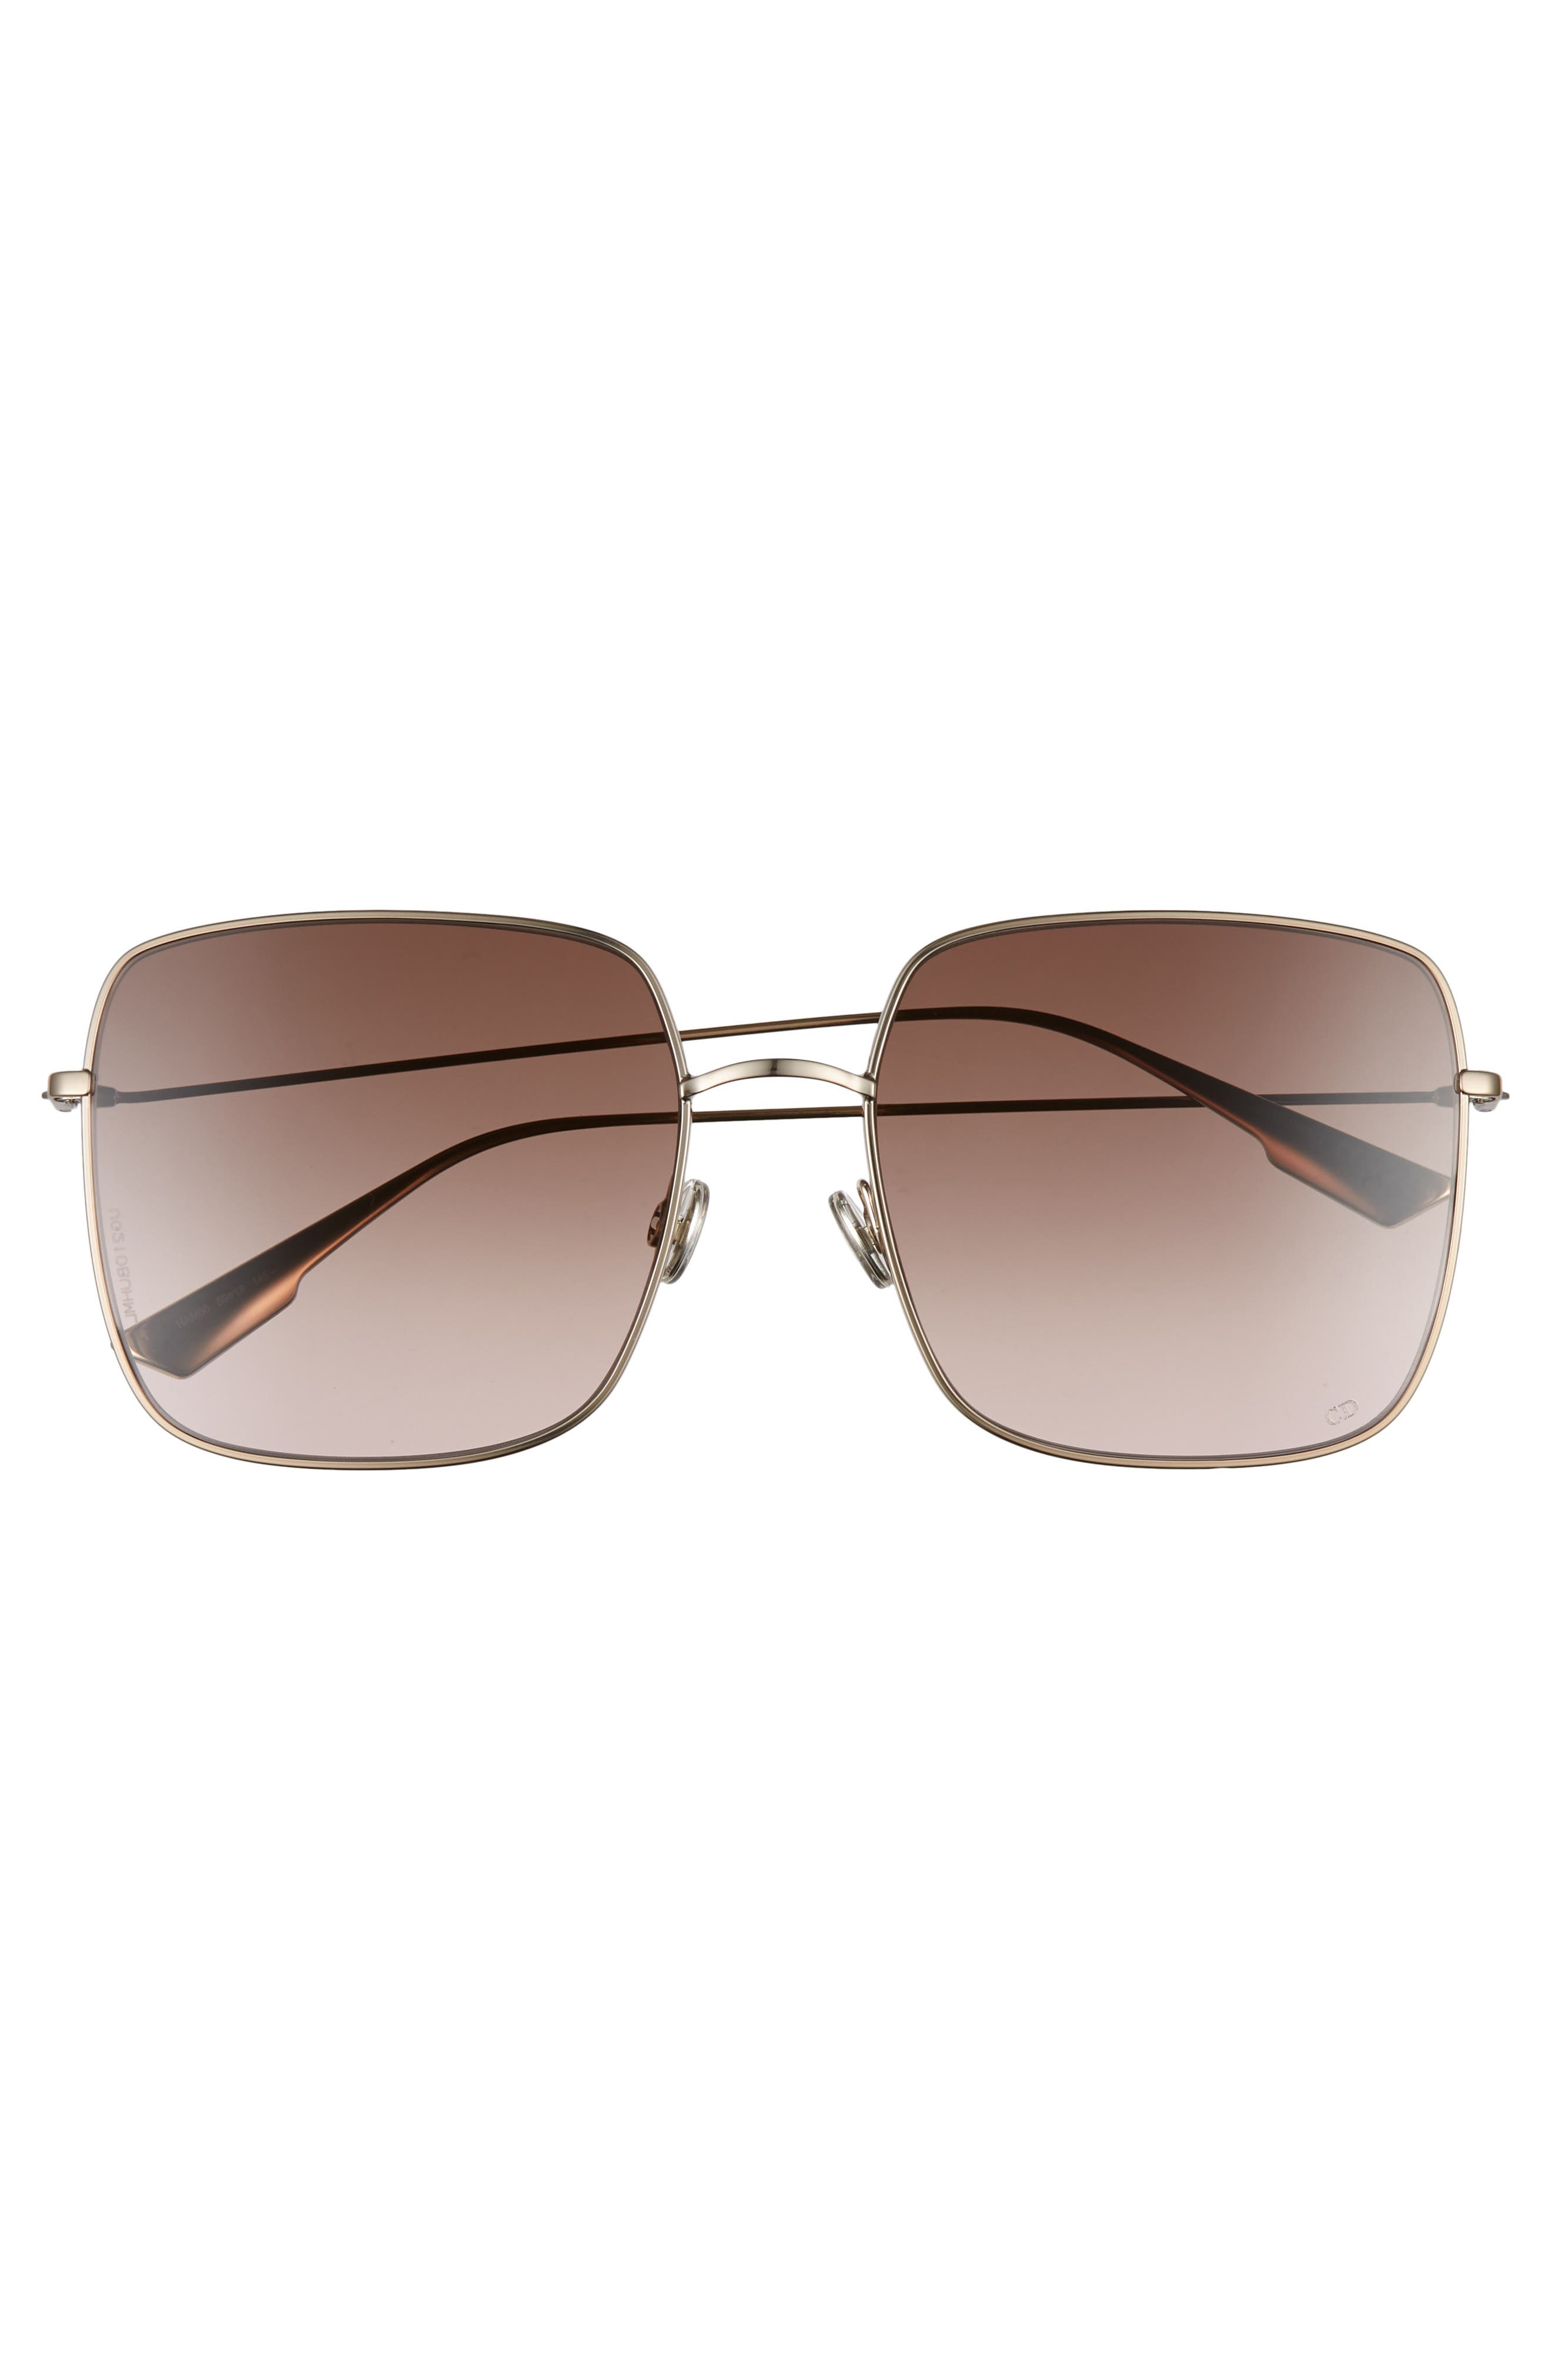 Stellaire 59mm Square Sunglasses,                             Alternate thumbnail 3, color,                             CHAMPAGNE